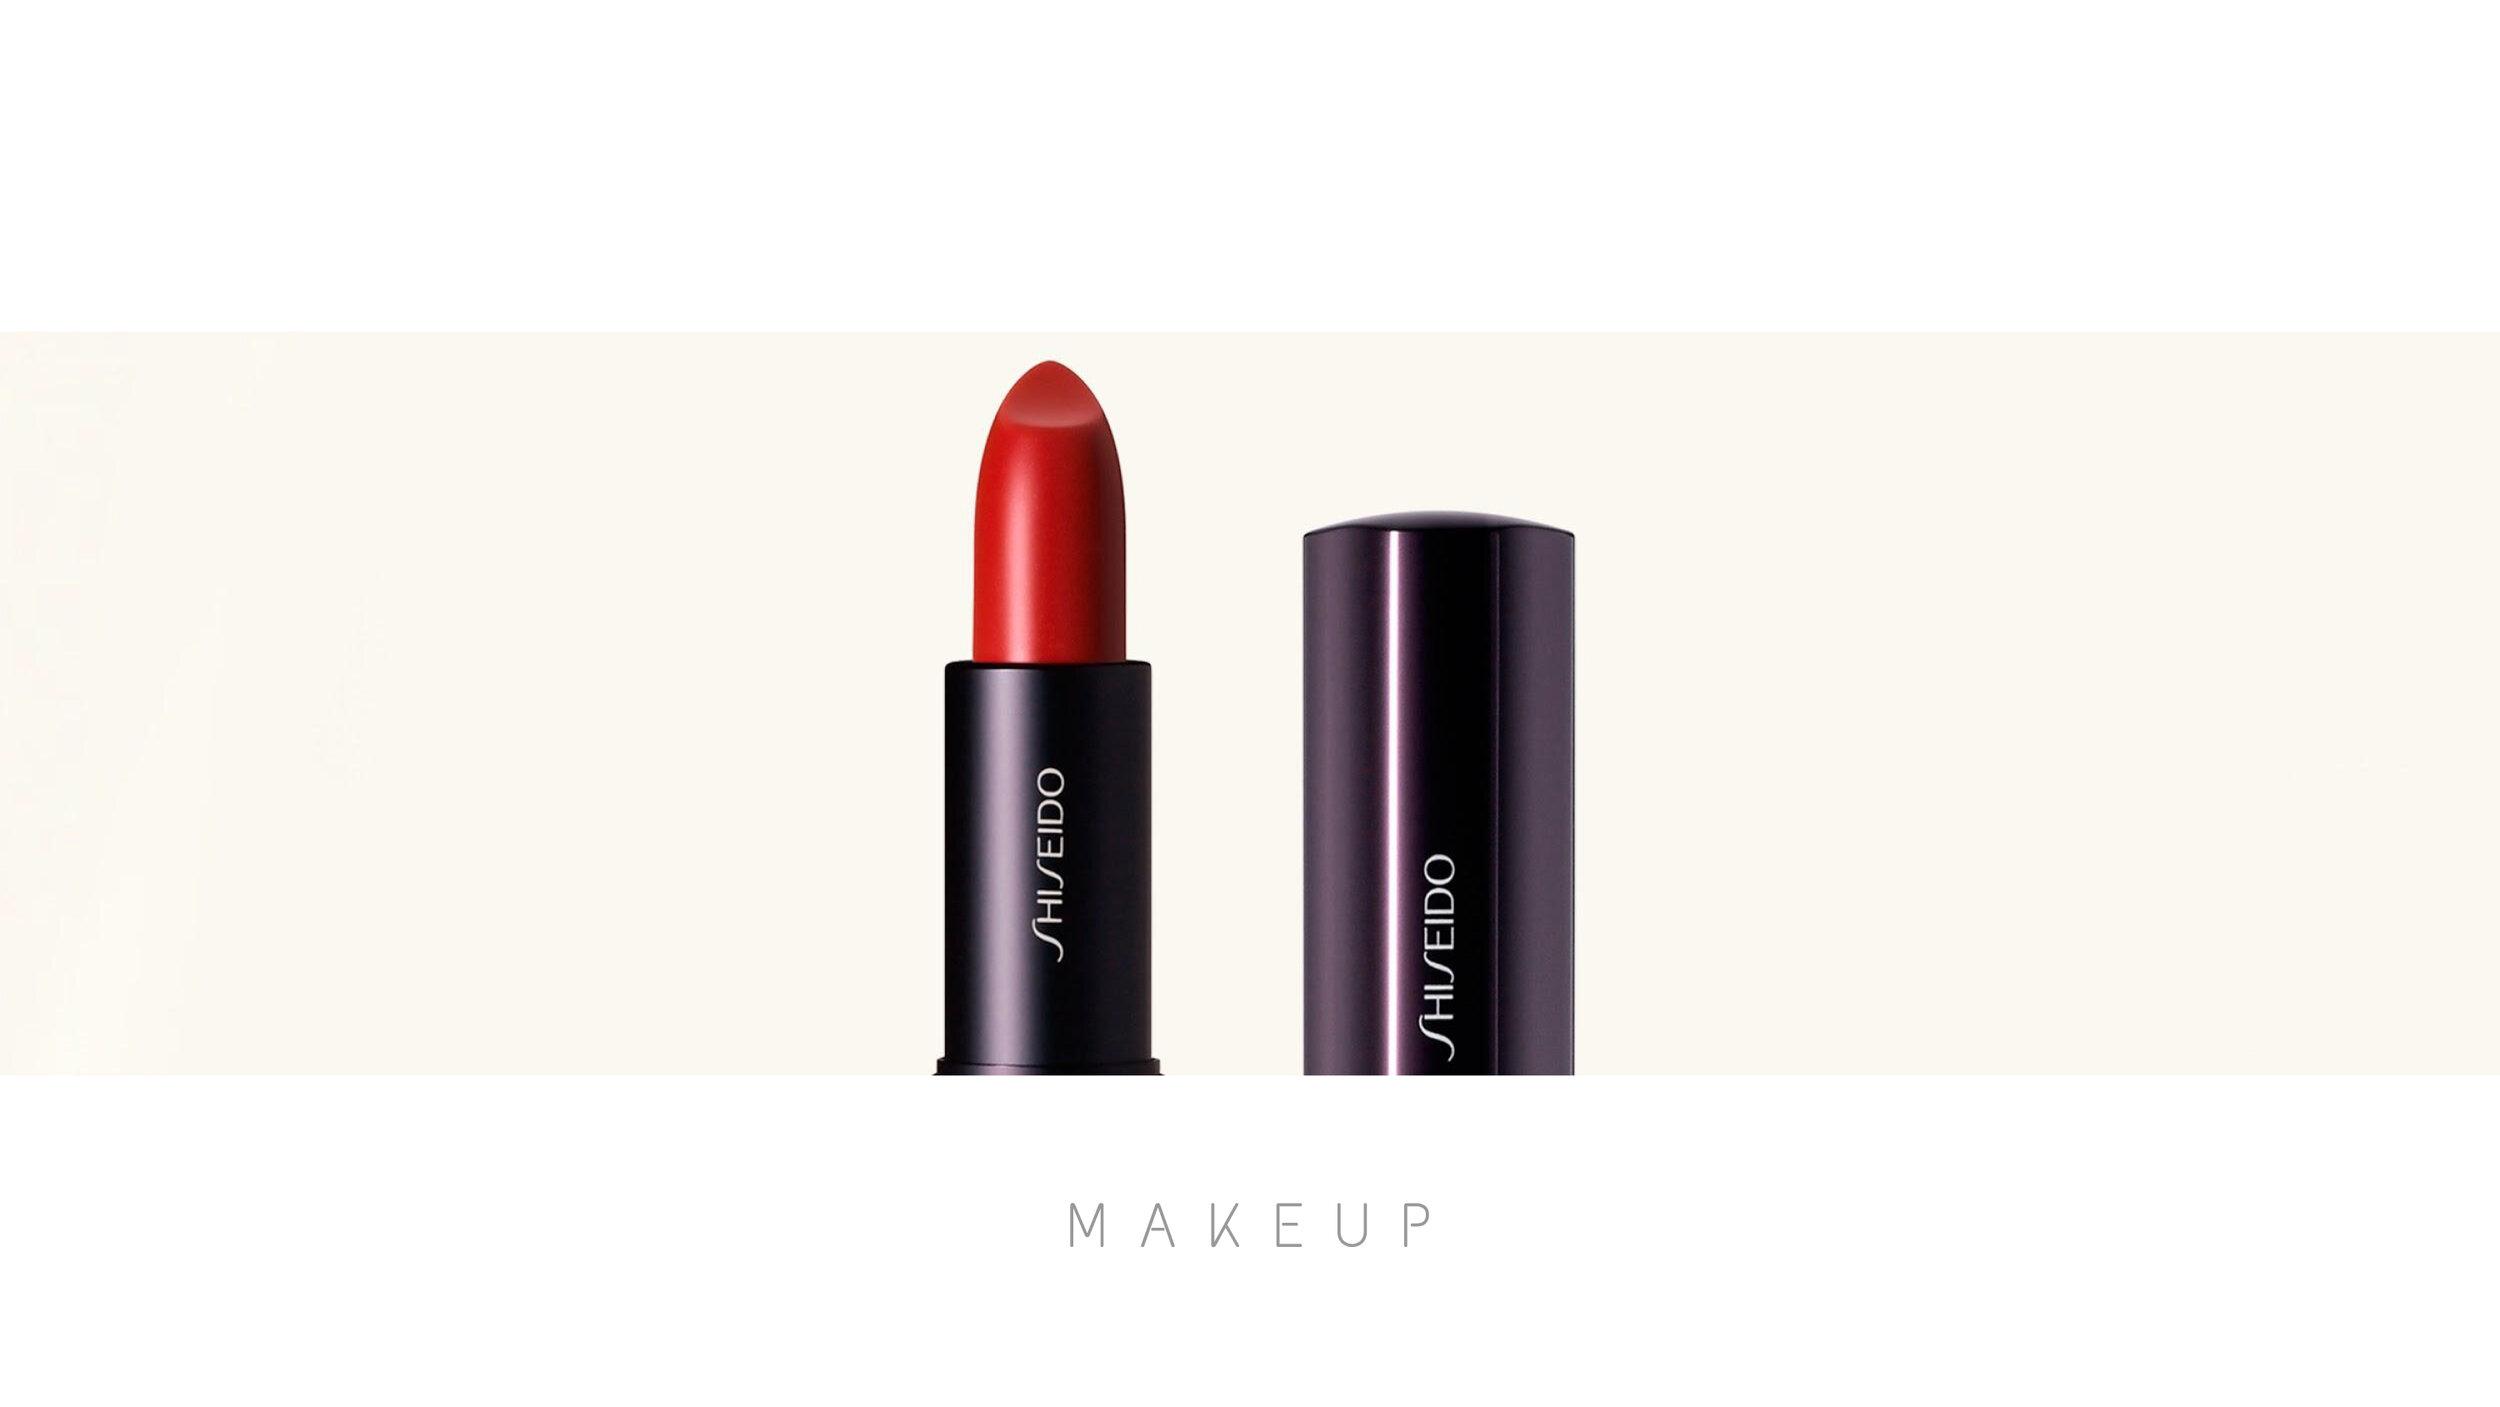 shiseido_brandbook_makeup1.jpg